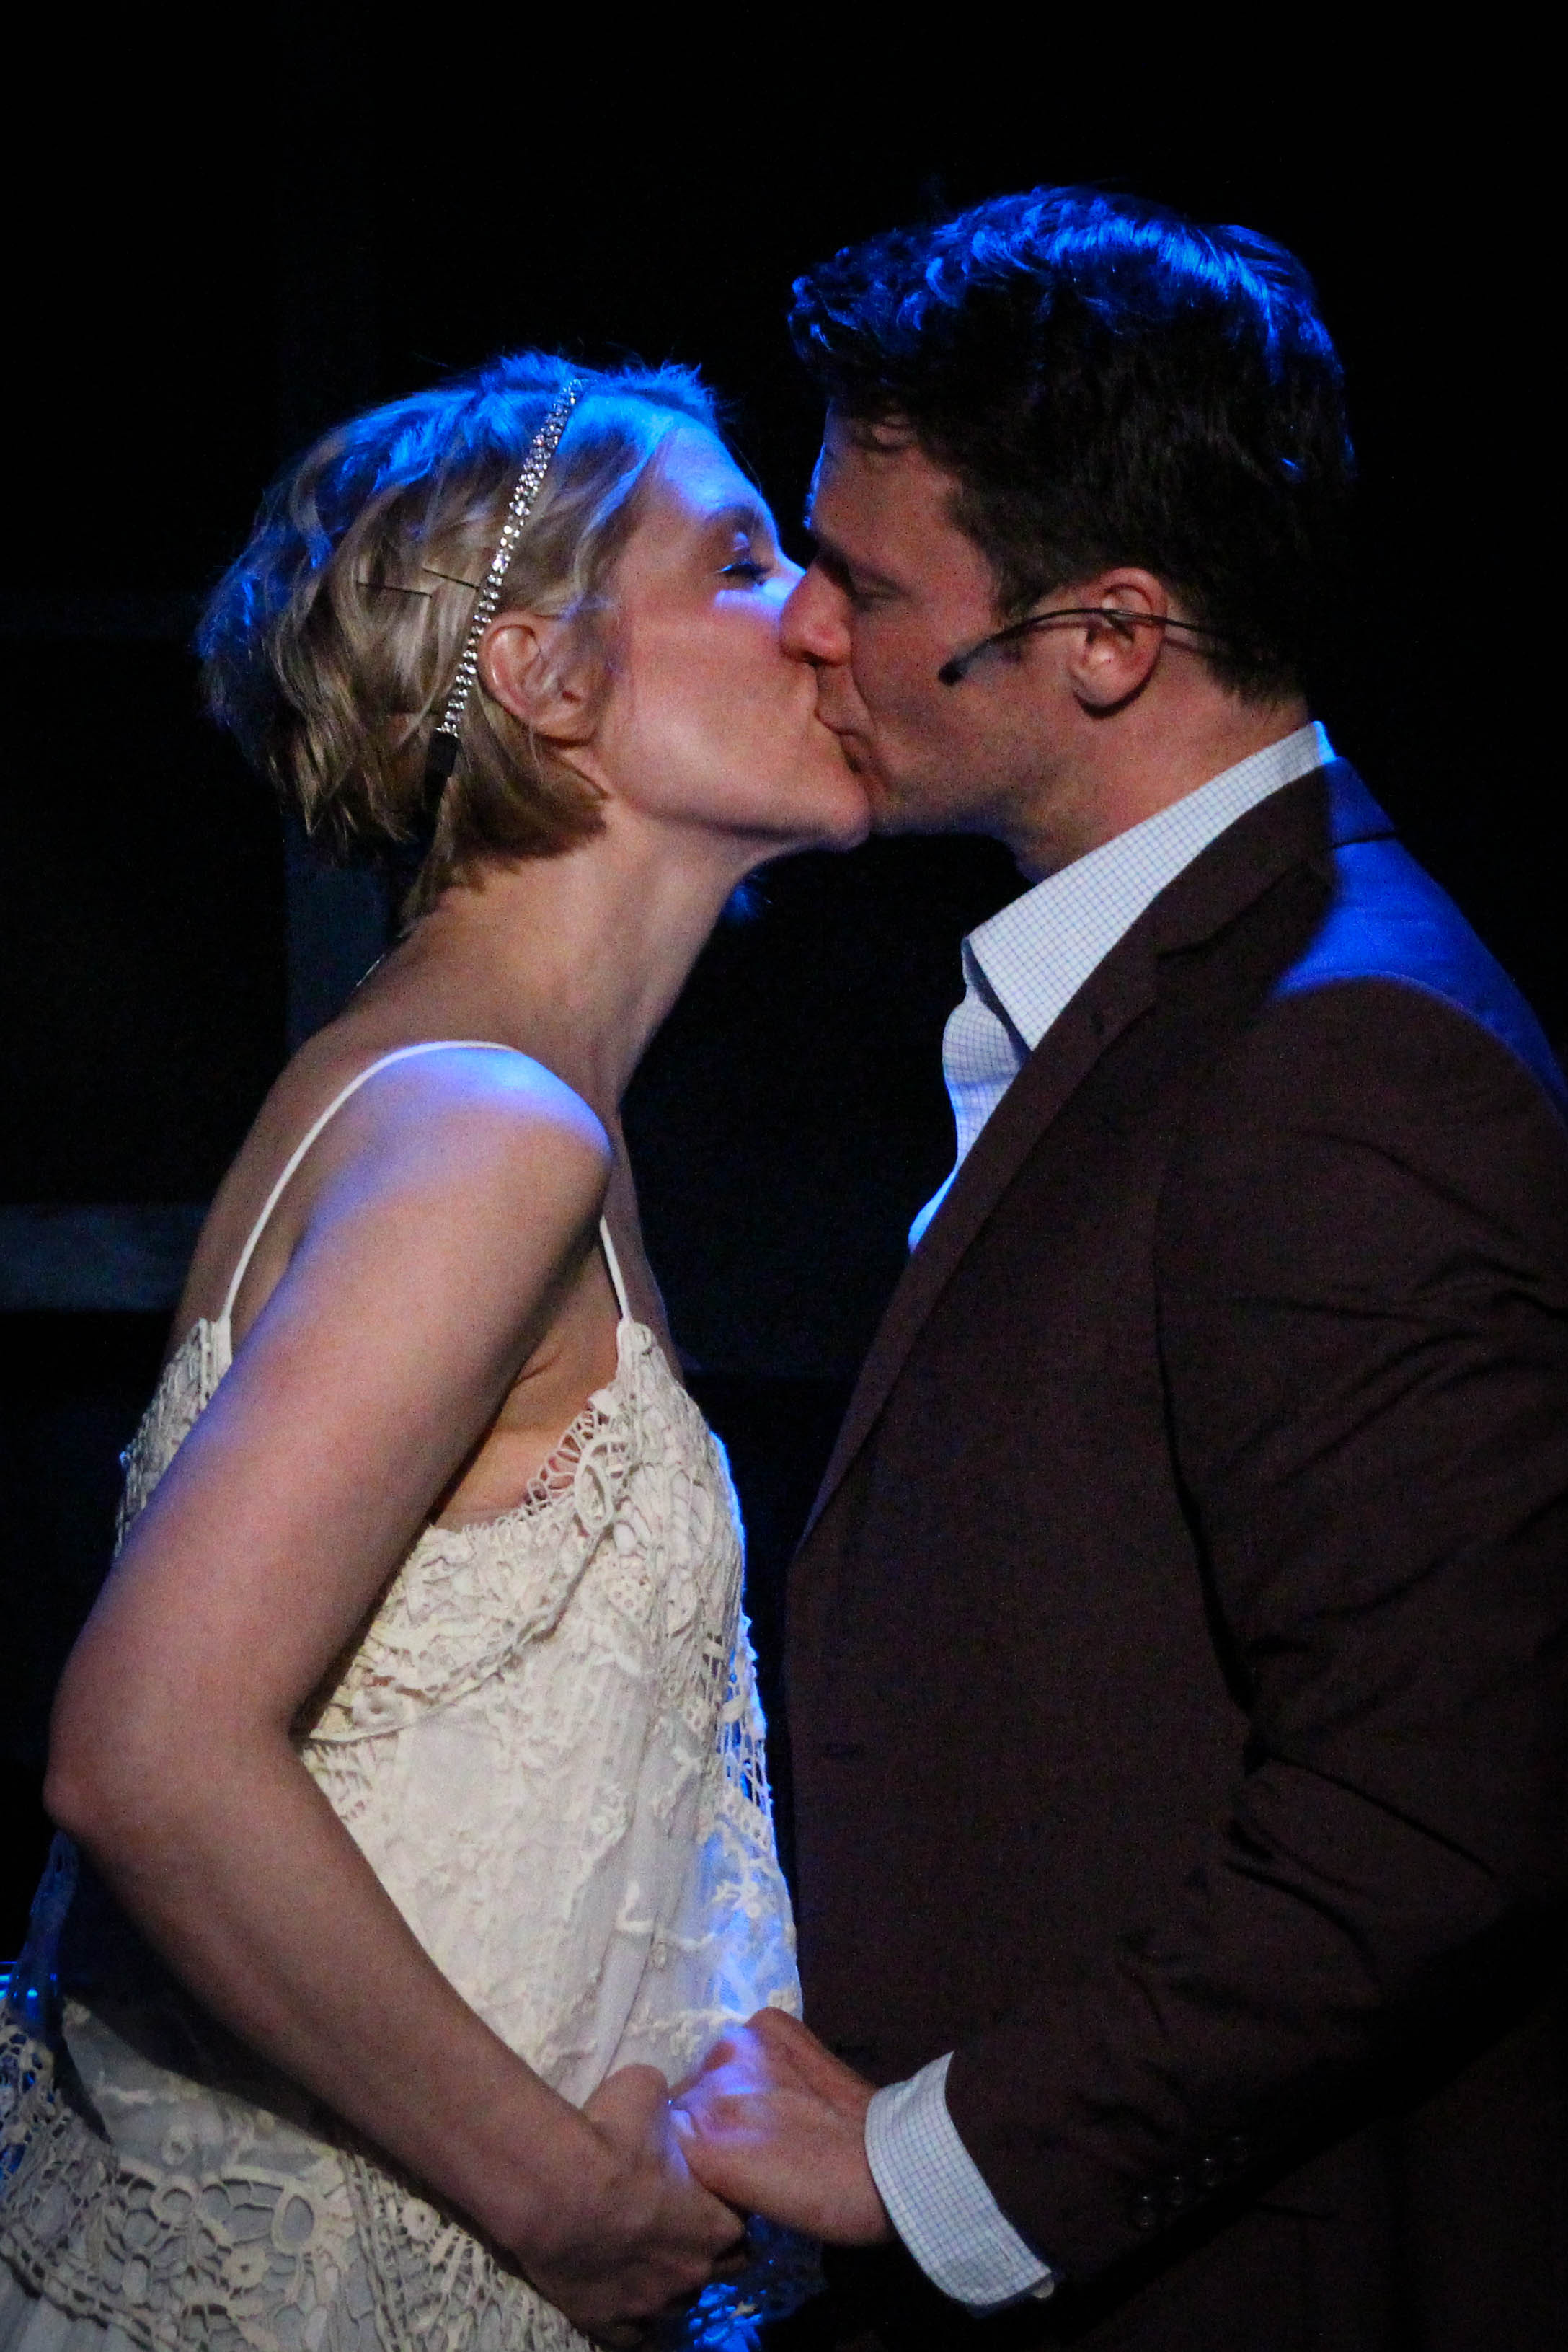 Jennifer Malenke and Nicolas Dromard